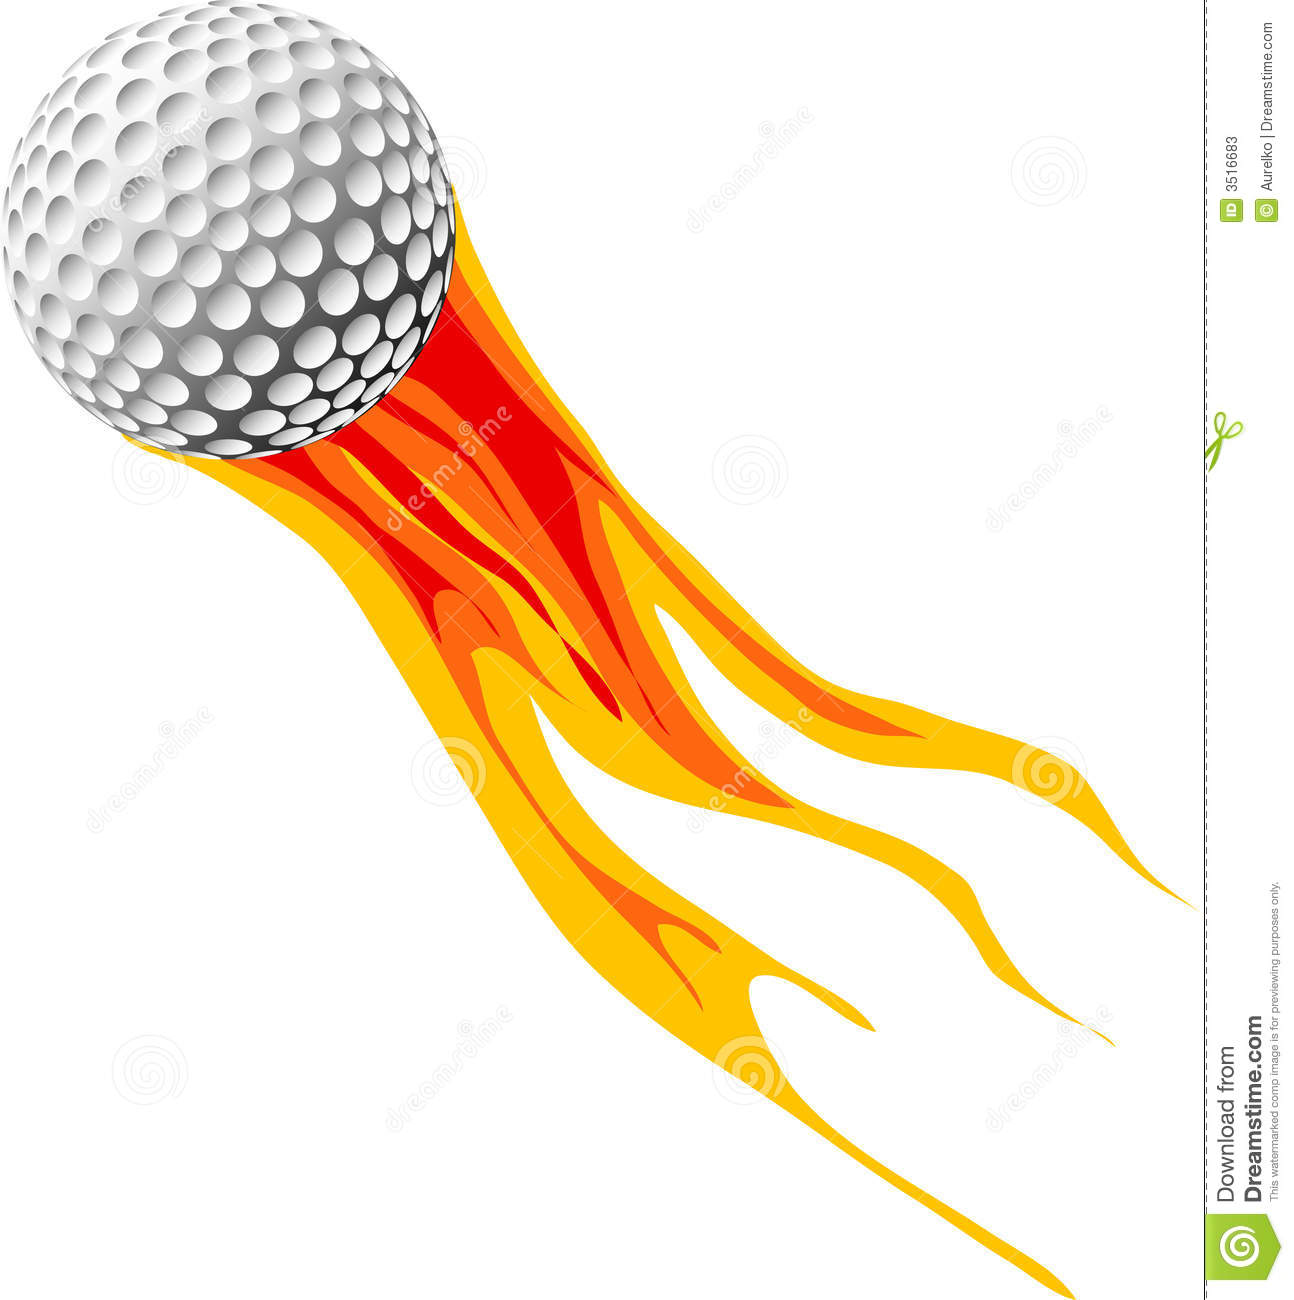 Flaming golf ball clipart vector freeuse stock Flaming golf ball clipart - ClipartFest vector freeuse stock